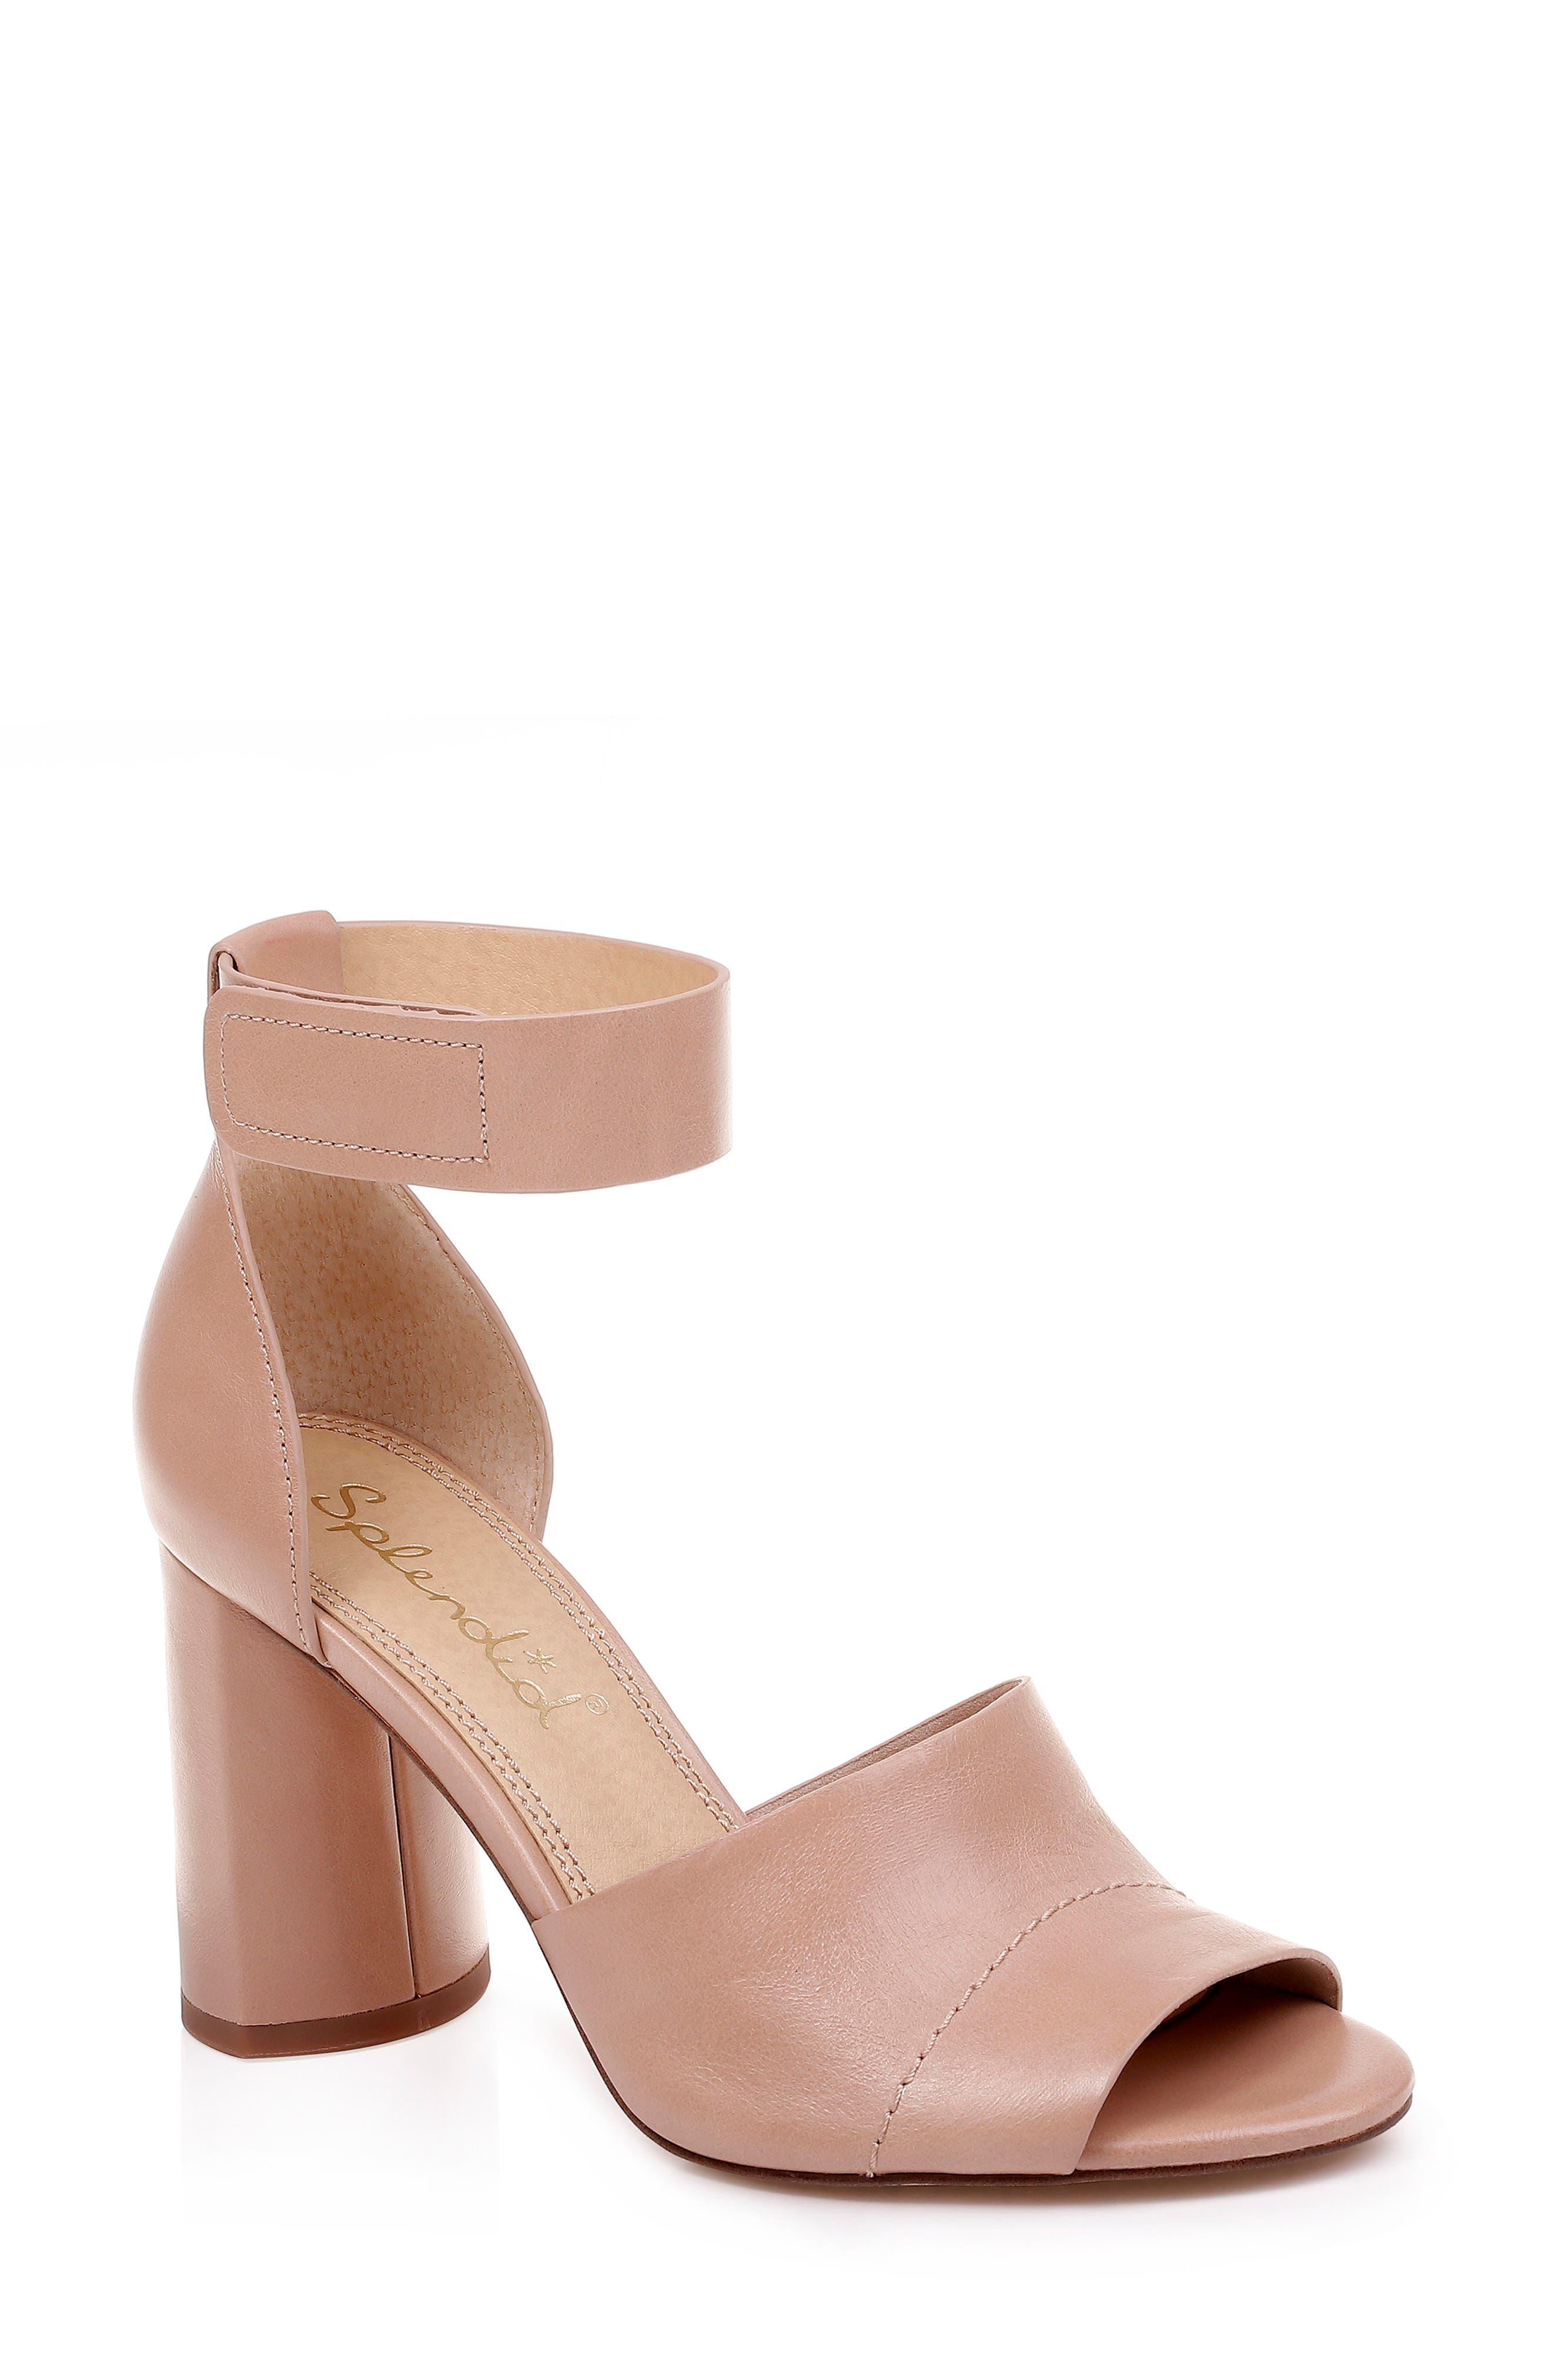 Splendid Thandie Ankle Strap Sandal- Beige